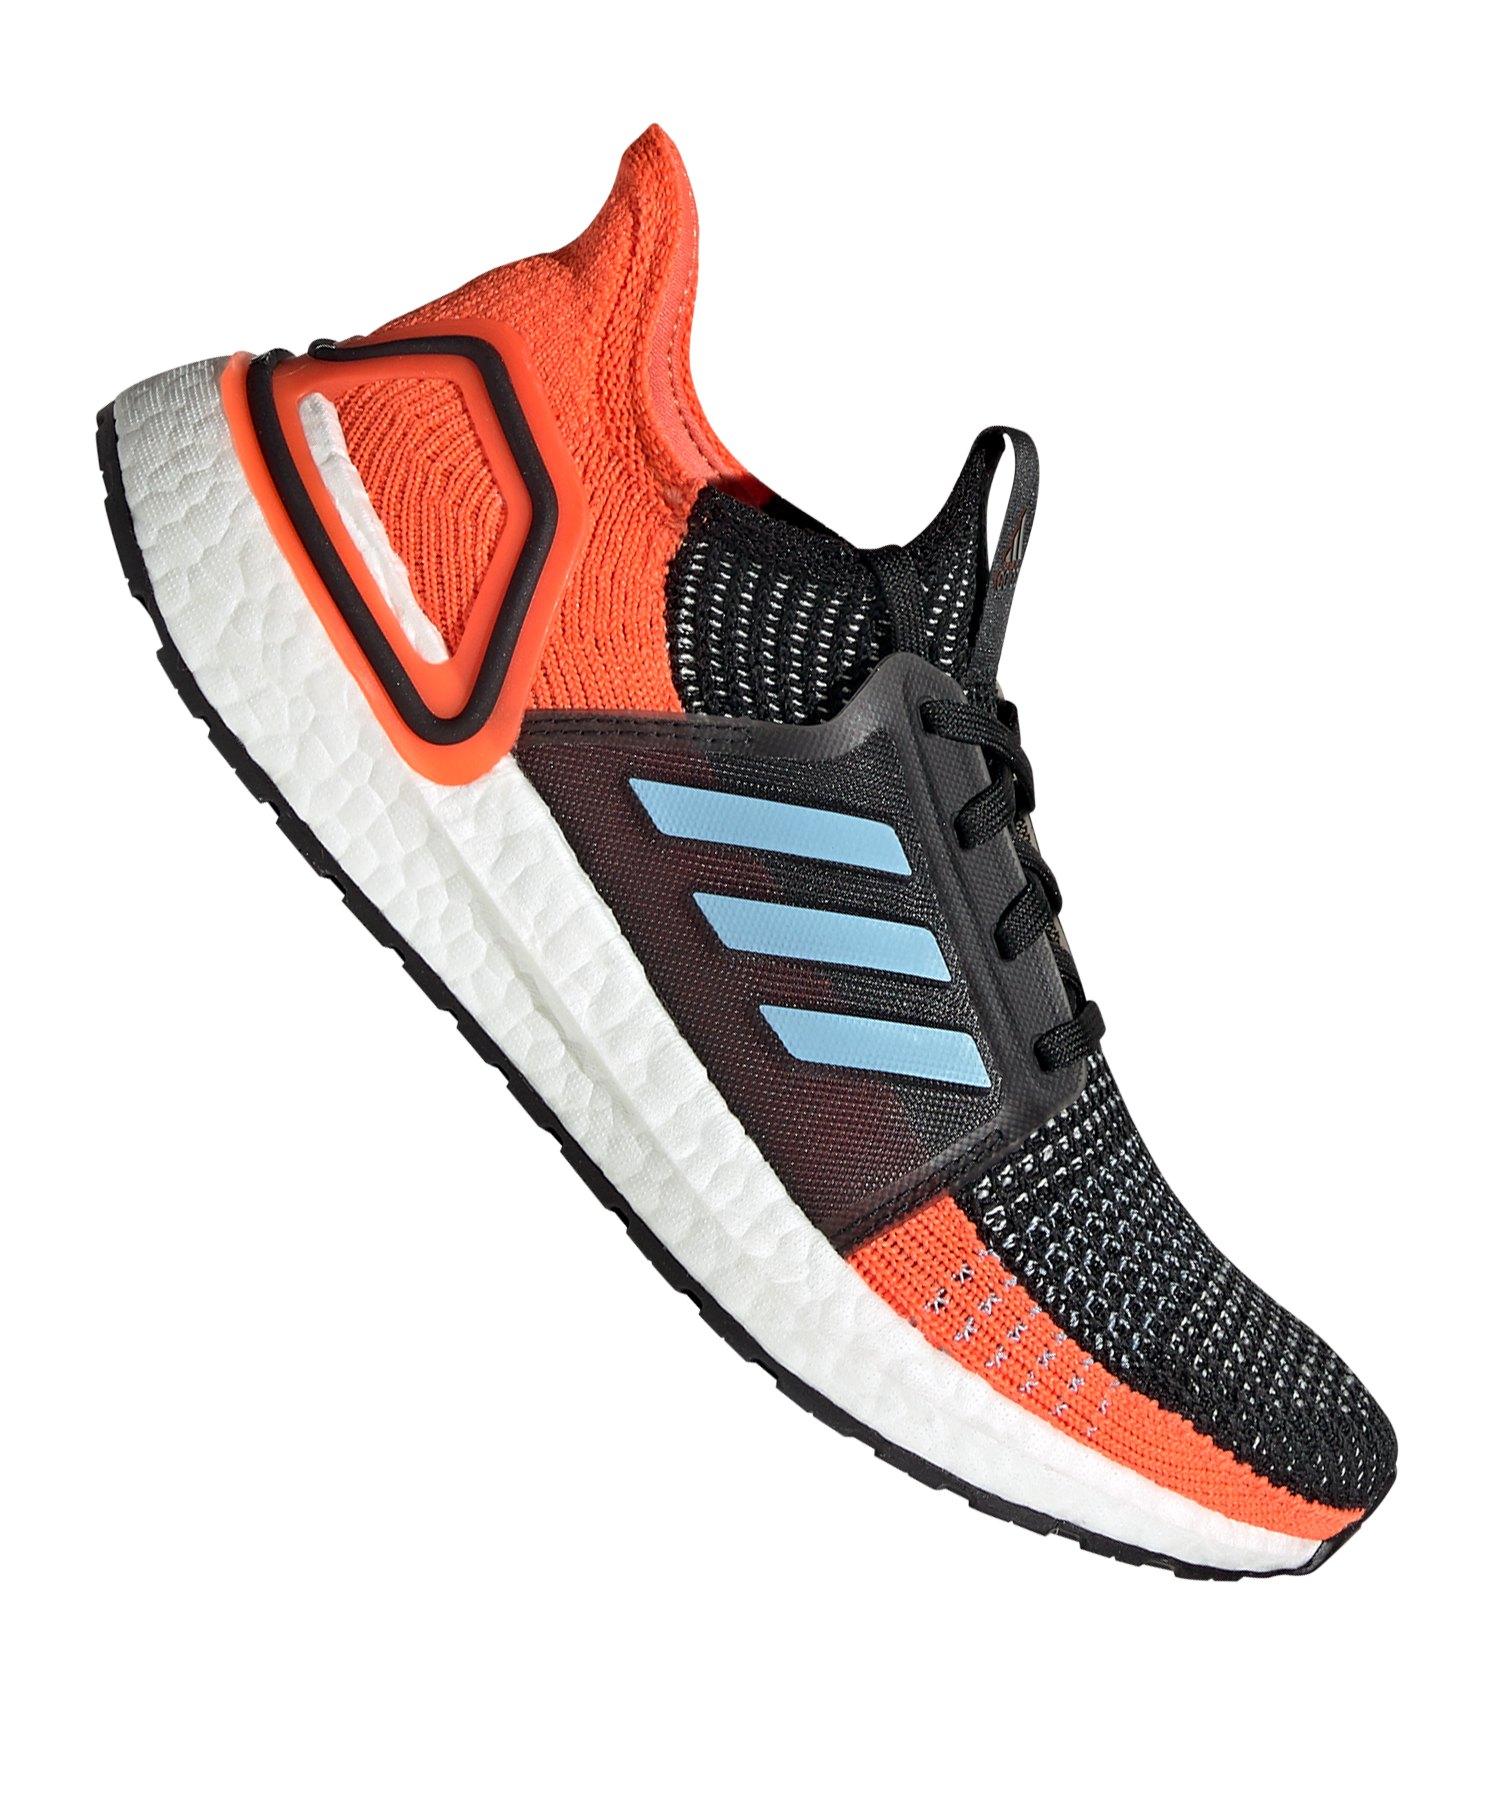 Adidas Energy Boost 3 laufschuhe Damen Weiß Blau sale